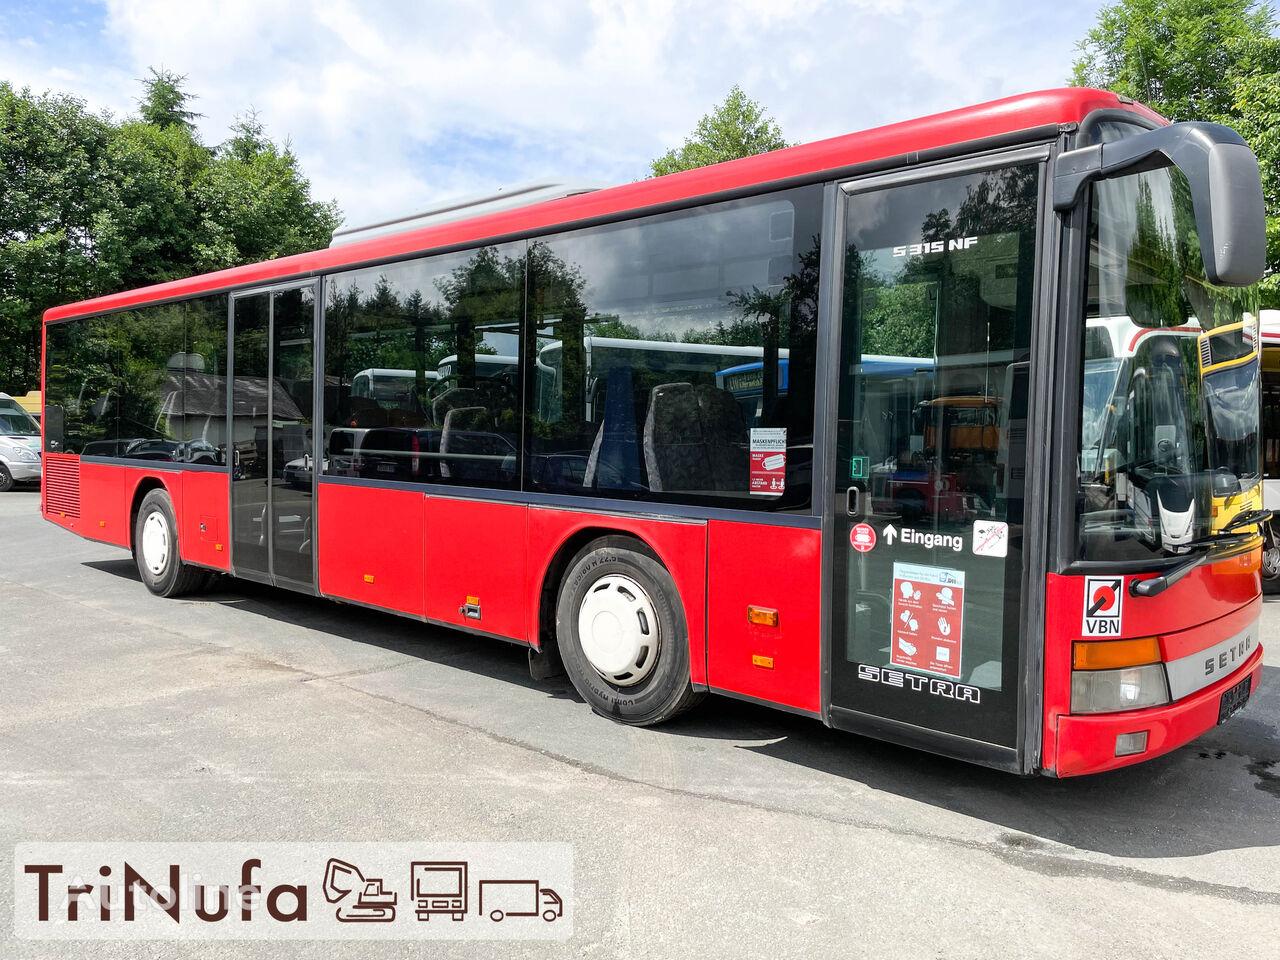 SETRA S 315 NF | Klima | Euro 3 | 299 PS | 47 Sitze |  városi busz